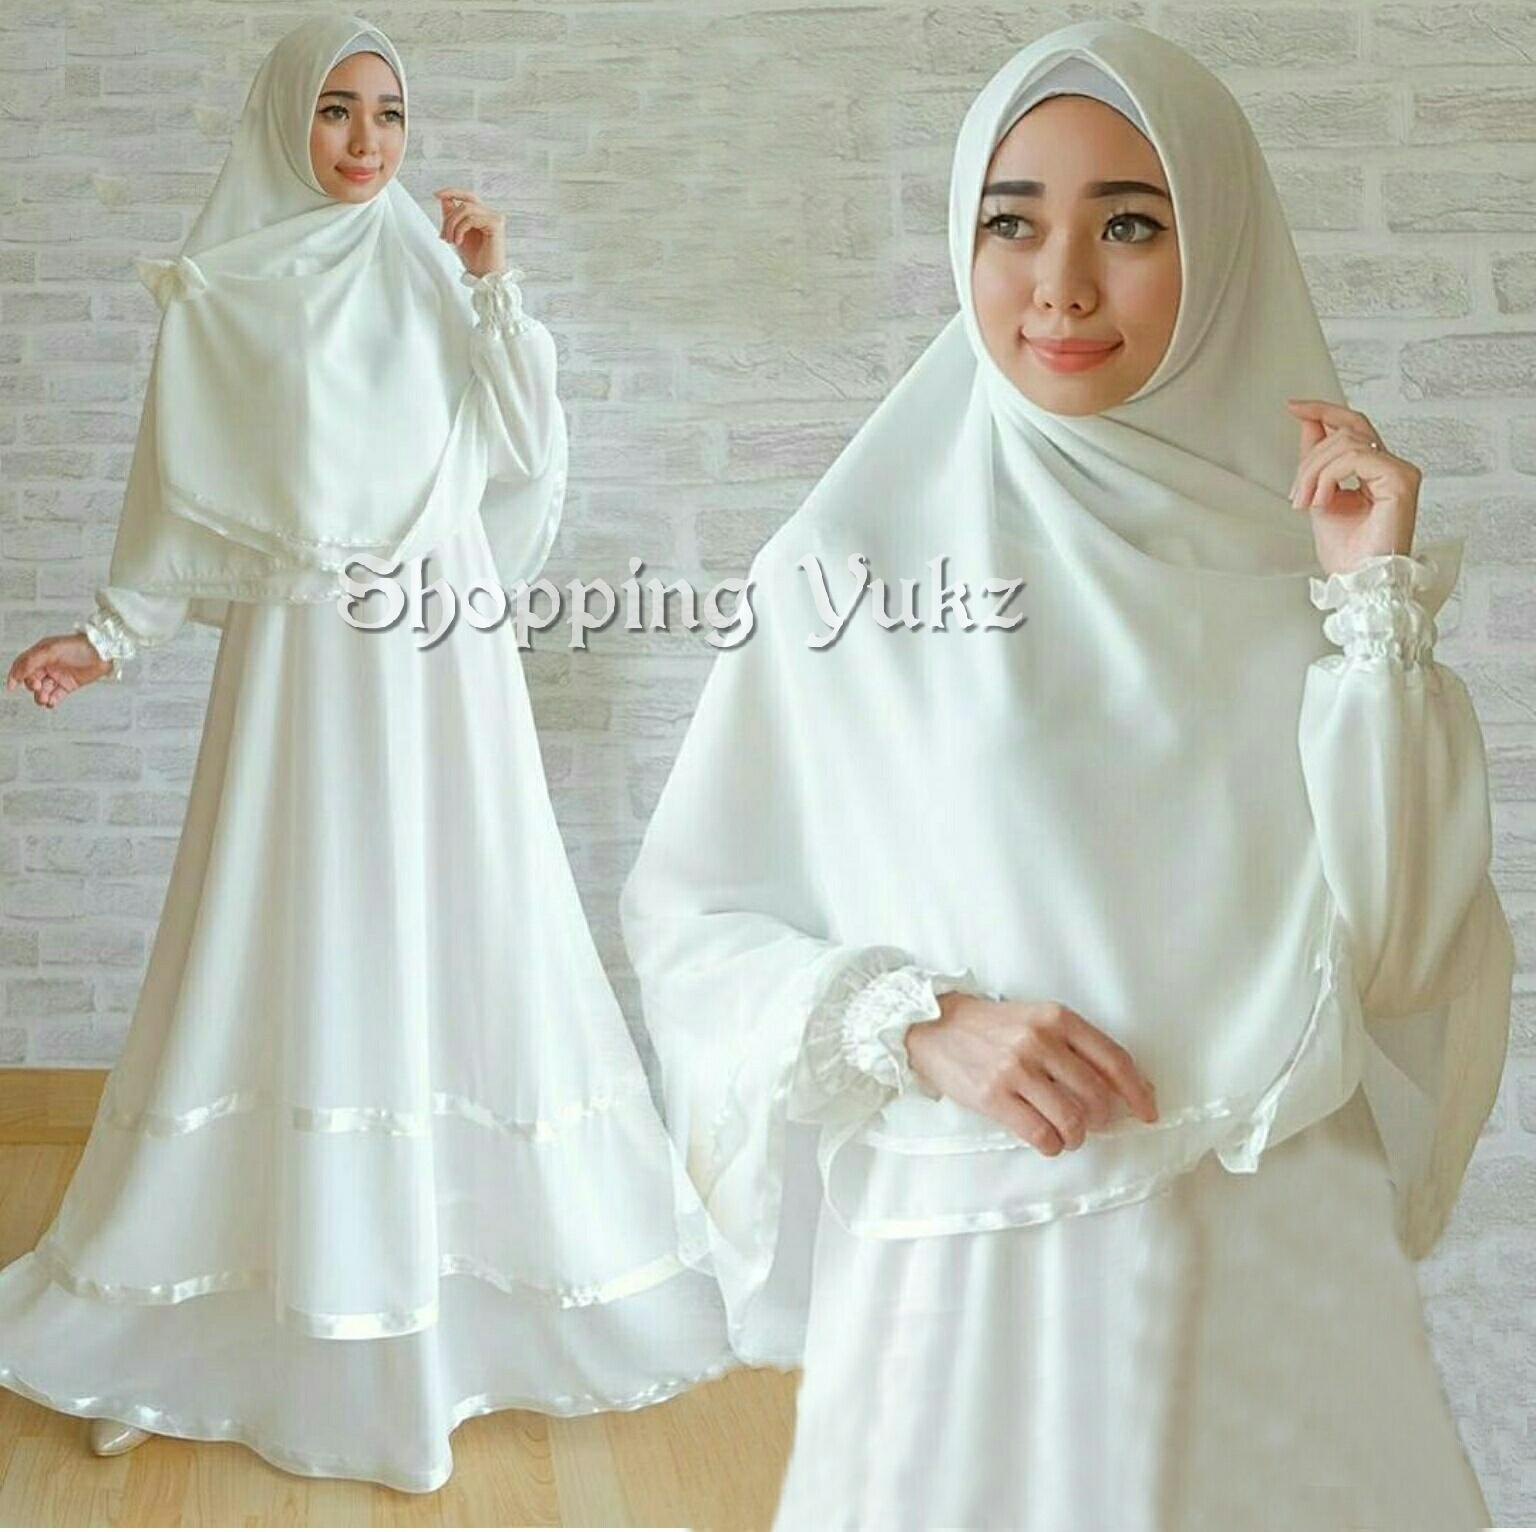 Shopping Yukz Baju Gamis Muslim Syari FITRI - PUTIH ( Dapat Jilbab ) /Dress Muslim / Fashion Muslim / Baju Muslimah / Gaun Muslim / Gamis Wanita / Hijab Muslim/ Gamis Murah